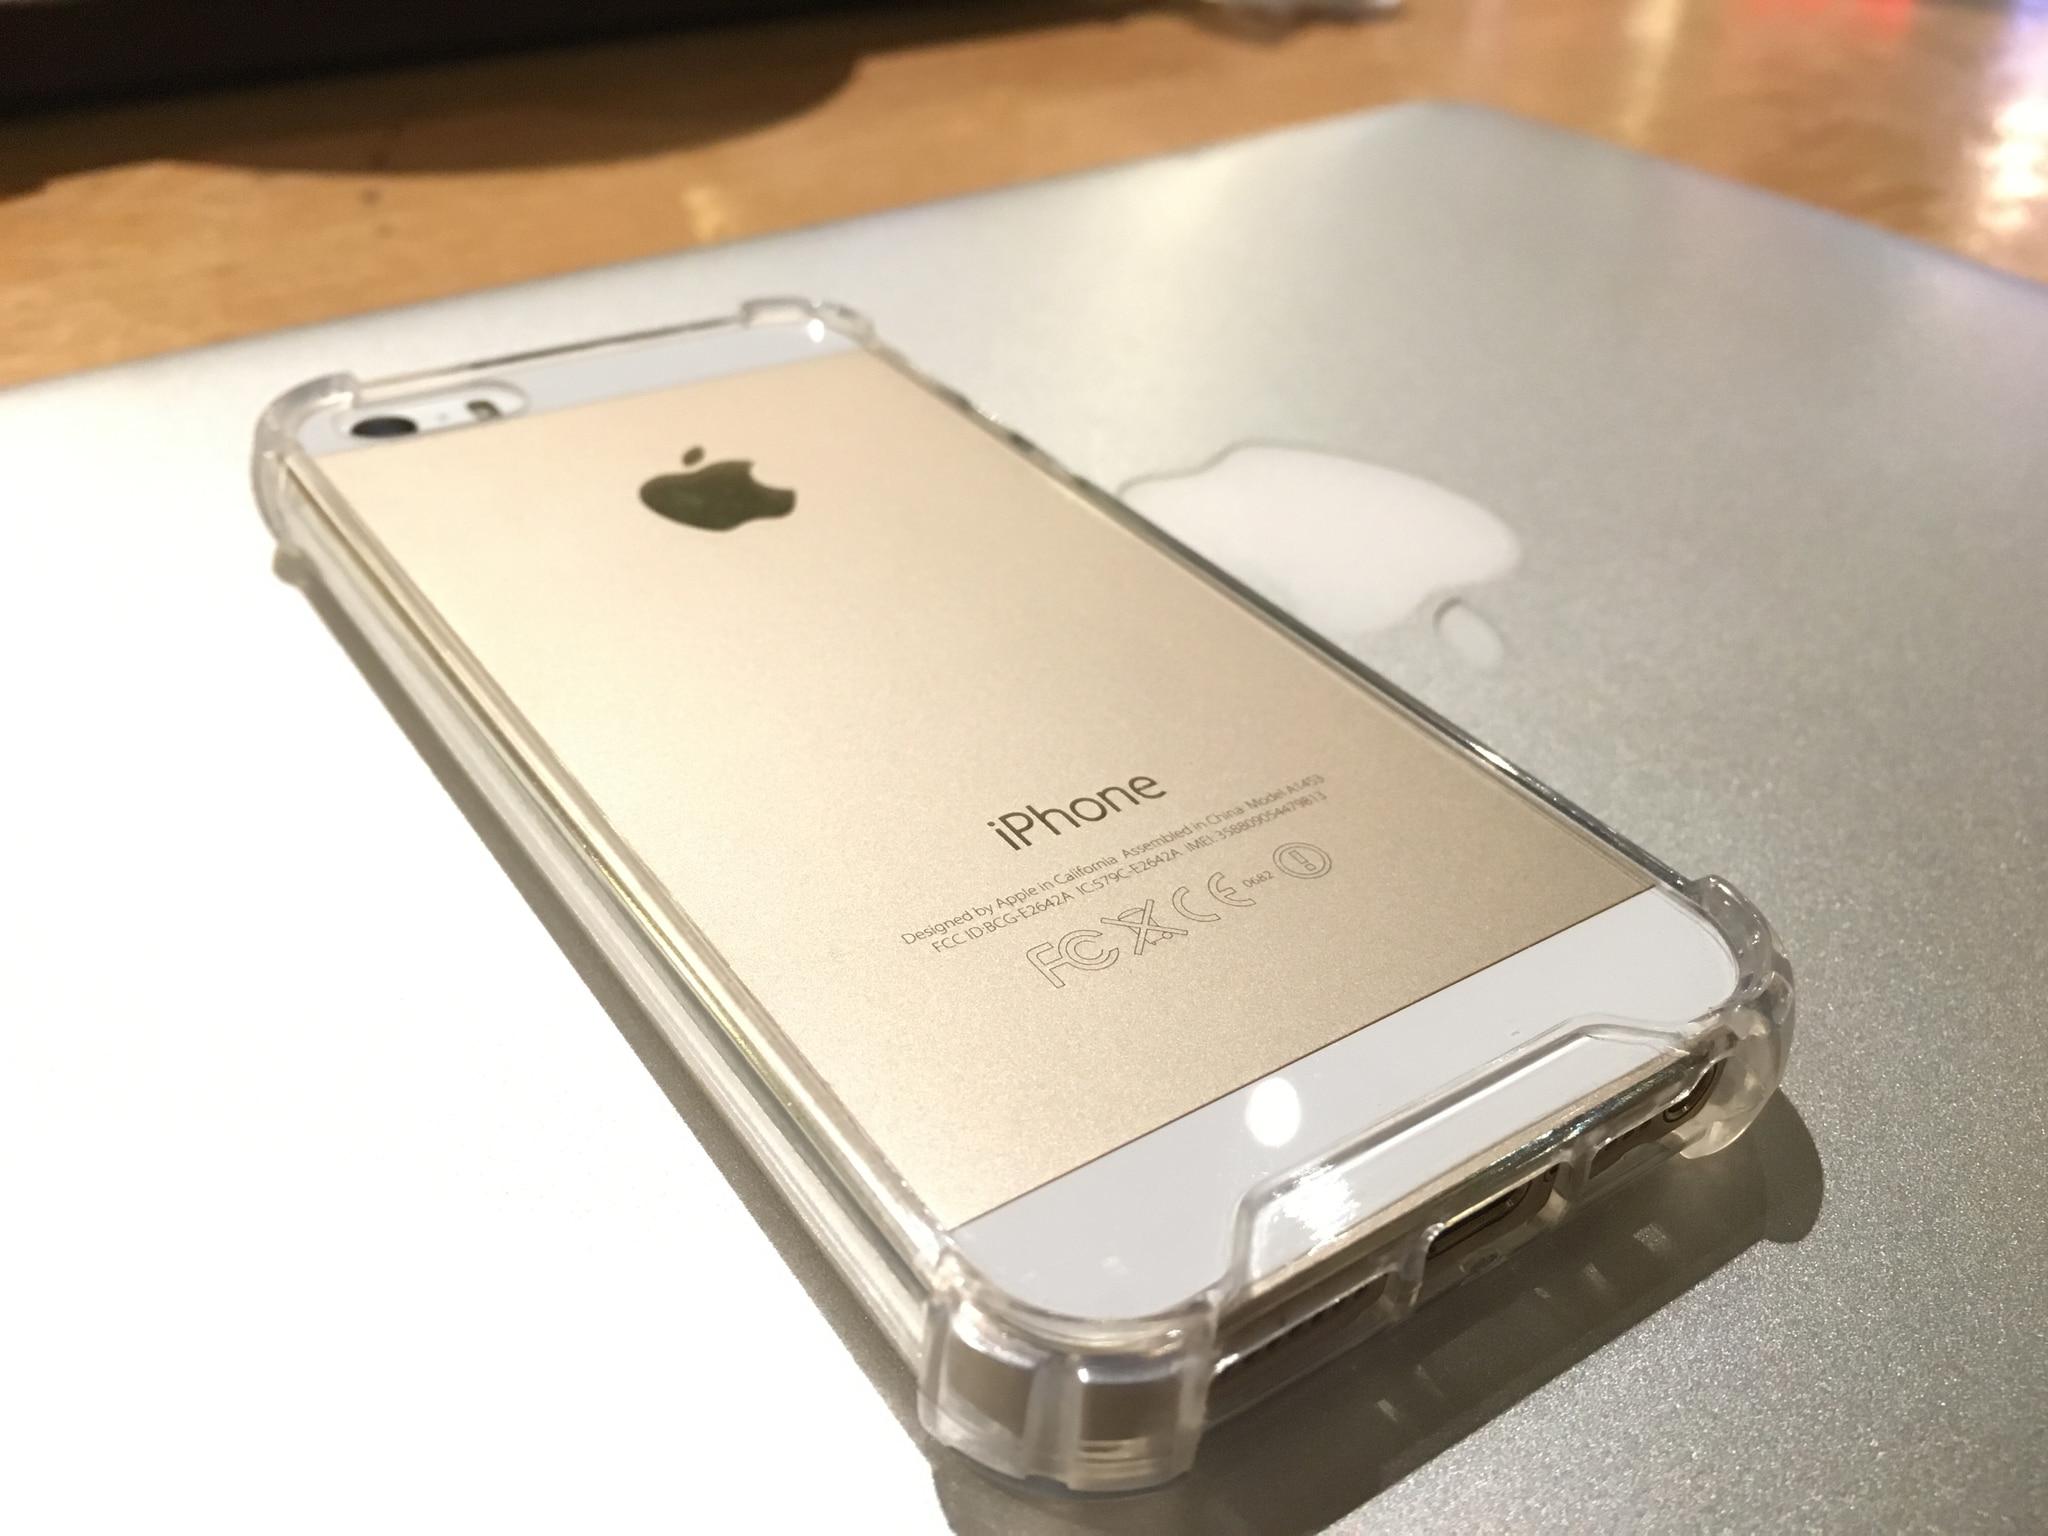 ... Kelebihan Oem Anticrack Case Anti Crack Case Anti Shock Case For Source Iphone 5 Anti Crack